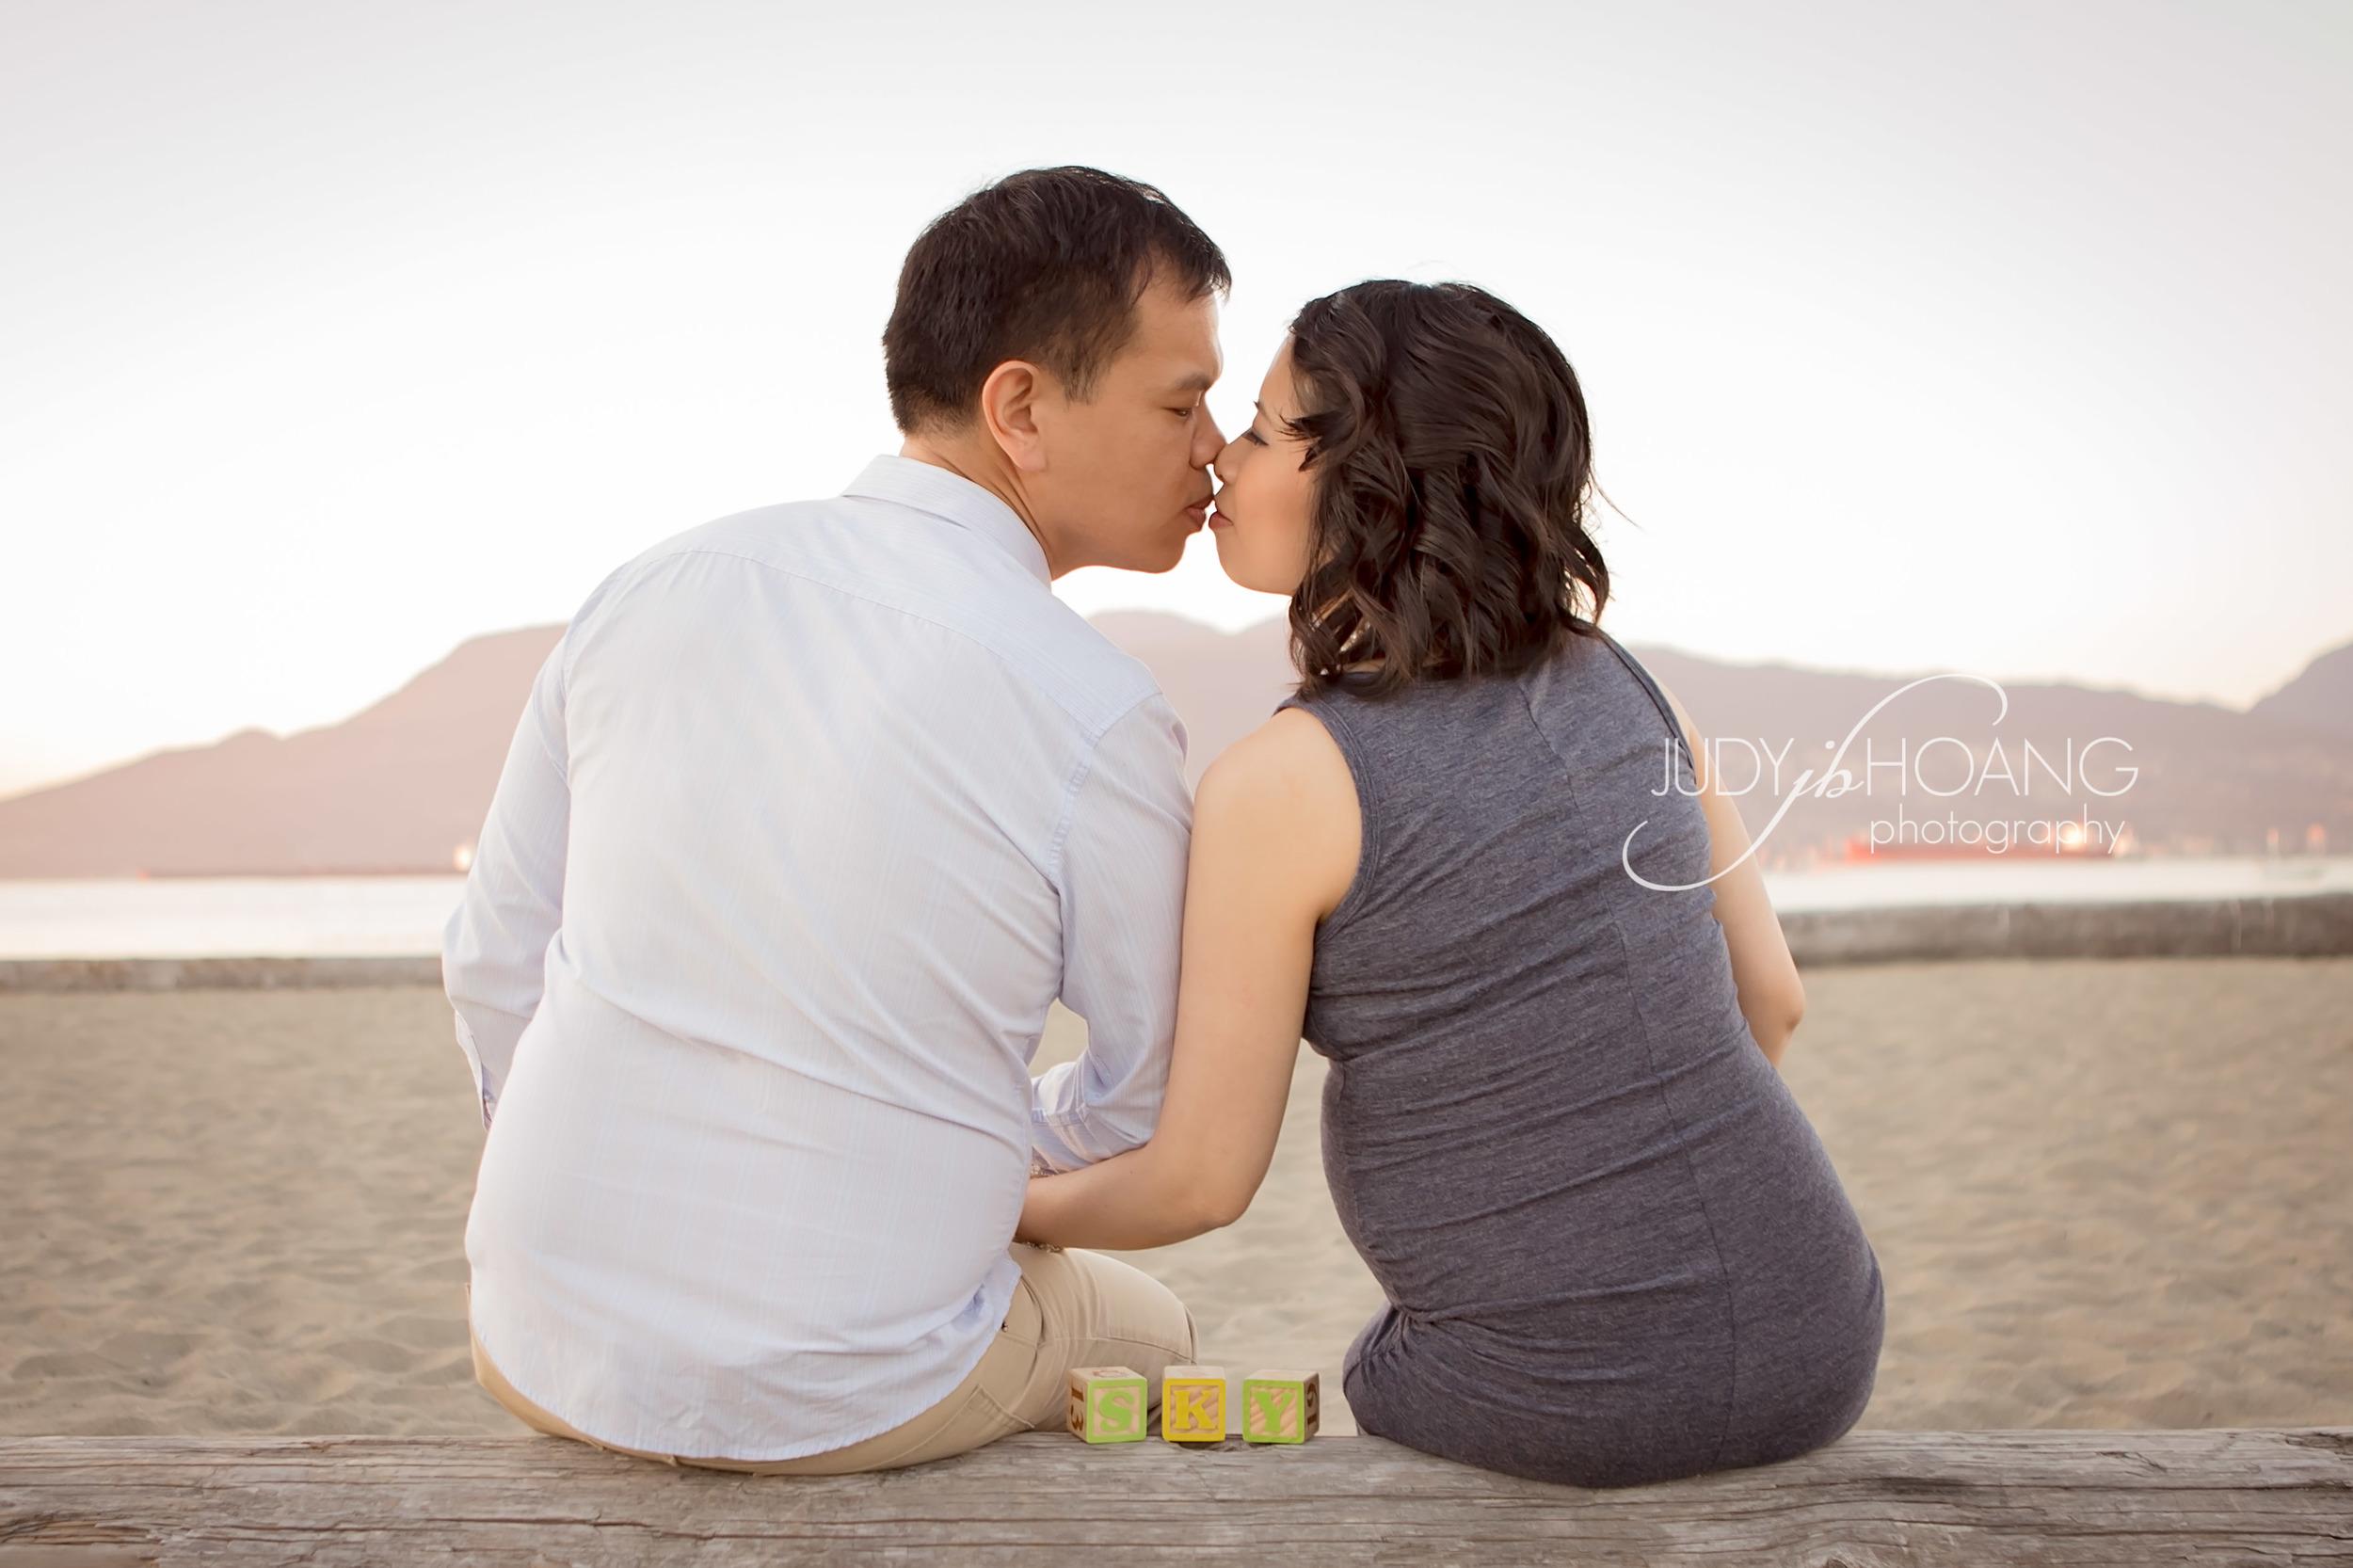 Judy Hoang Photography - Outdoor Maternity-1.JPG